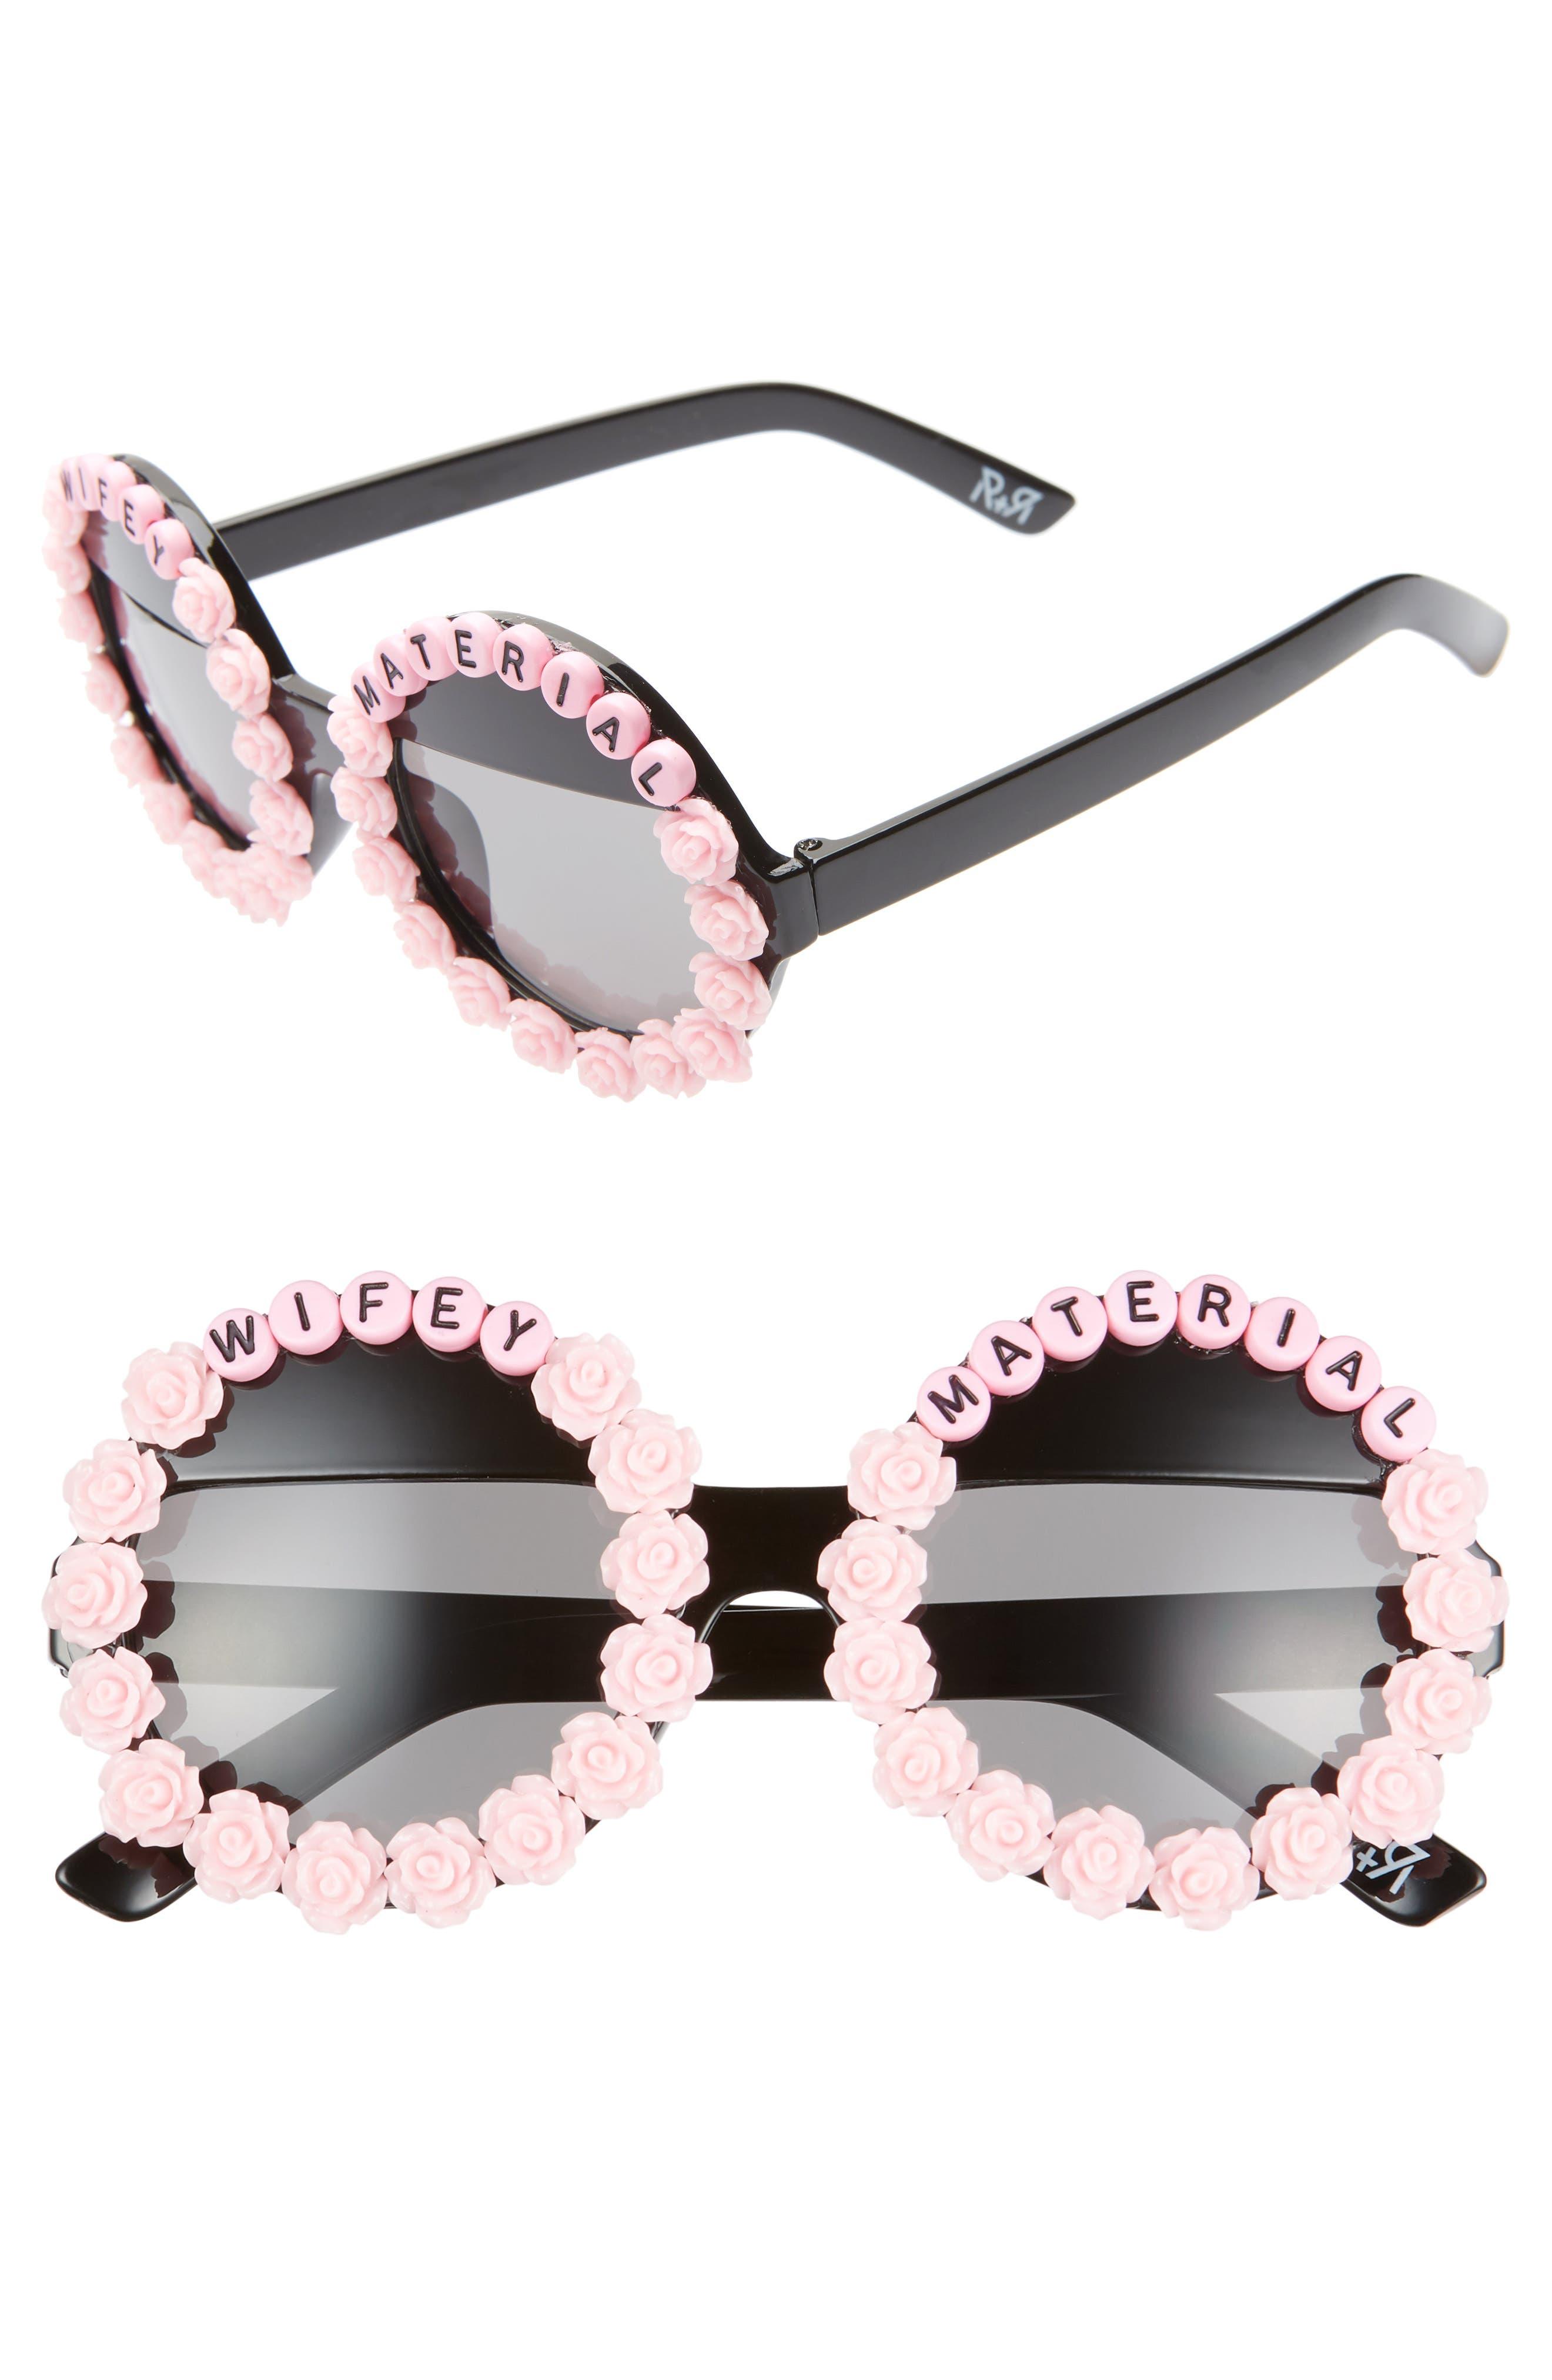 Rad + Refined Wifey Material Flower Round Sunglasses - Pink/ Black